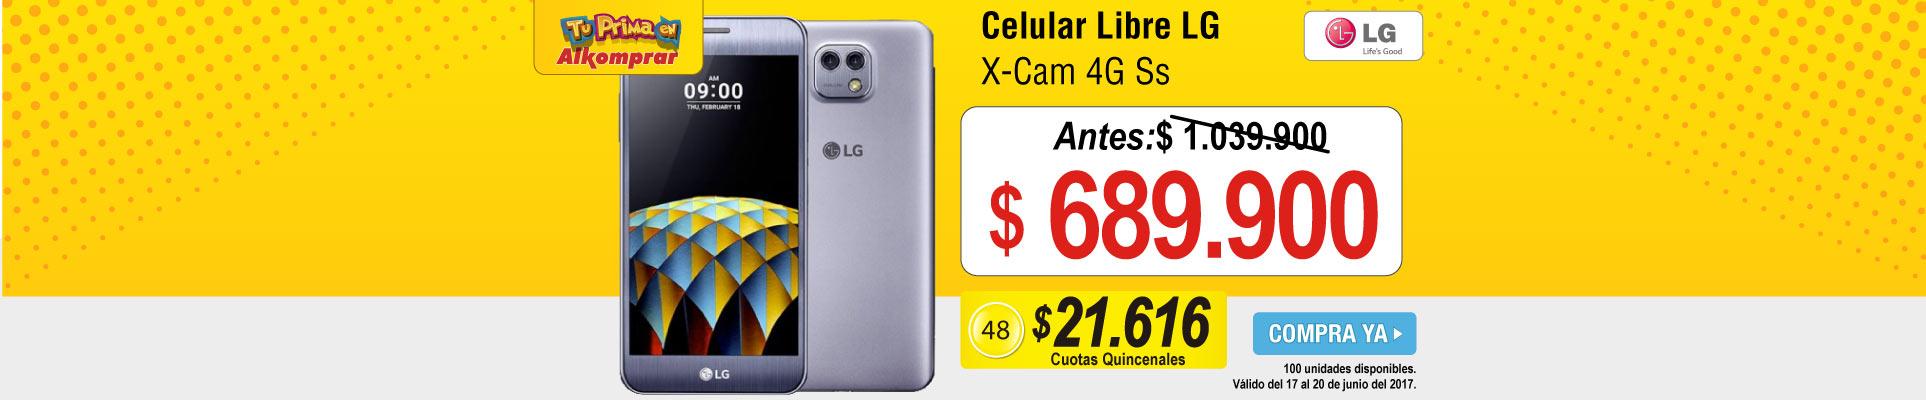 Celular Libre LG X-Cam 4G Ss  - banner principal